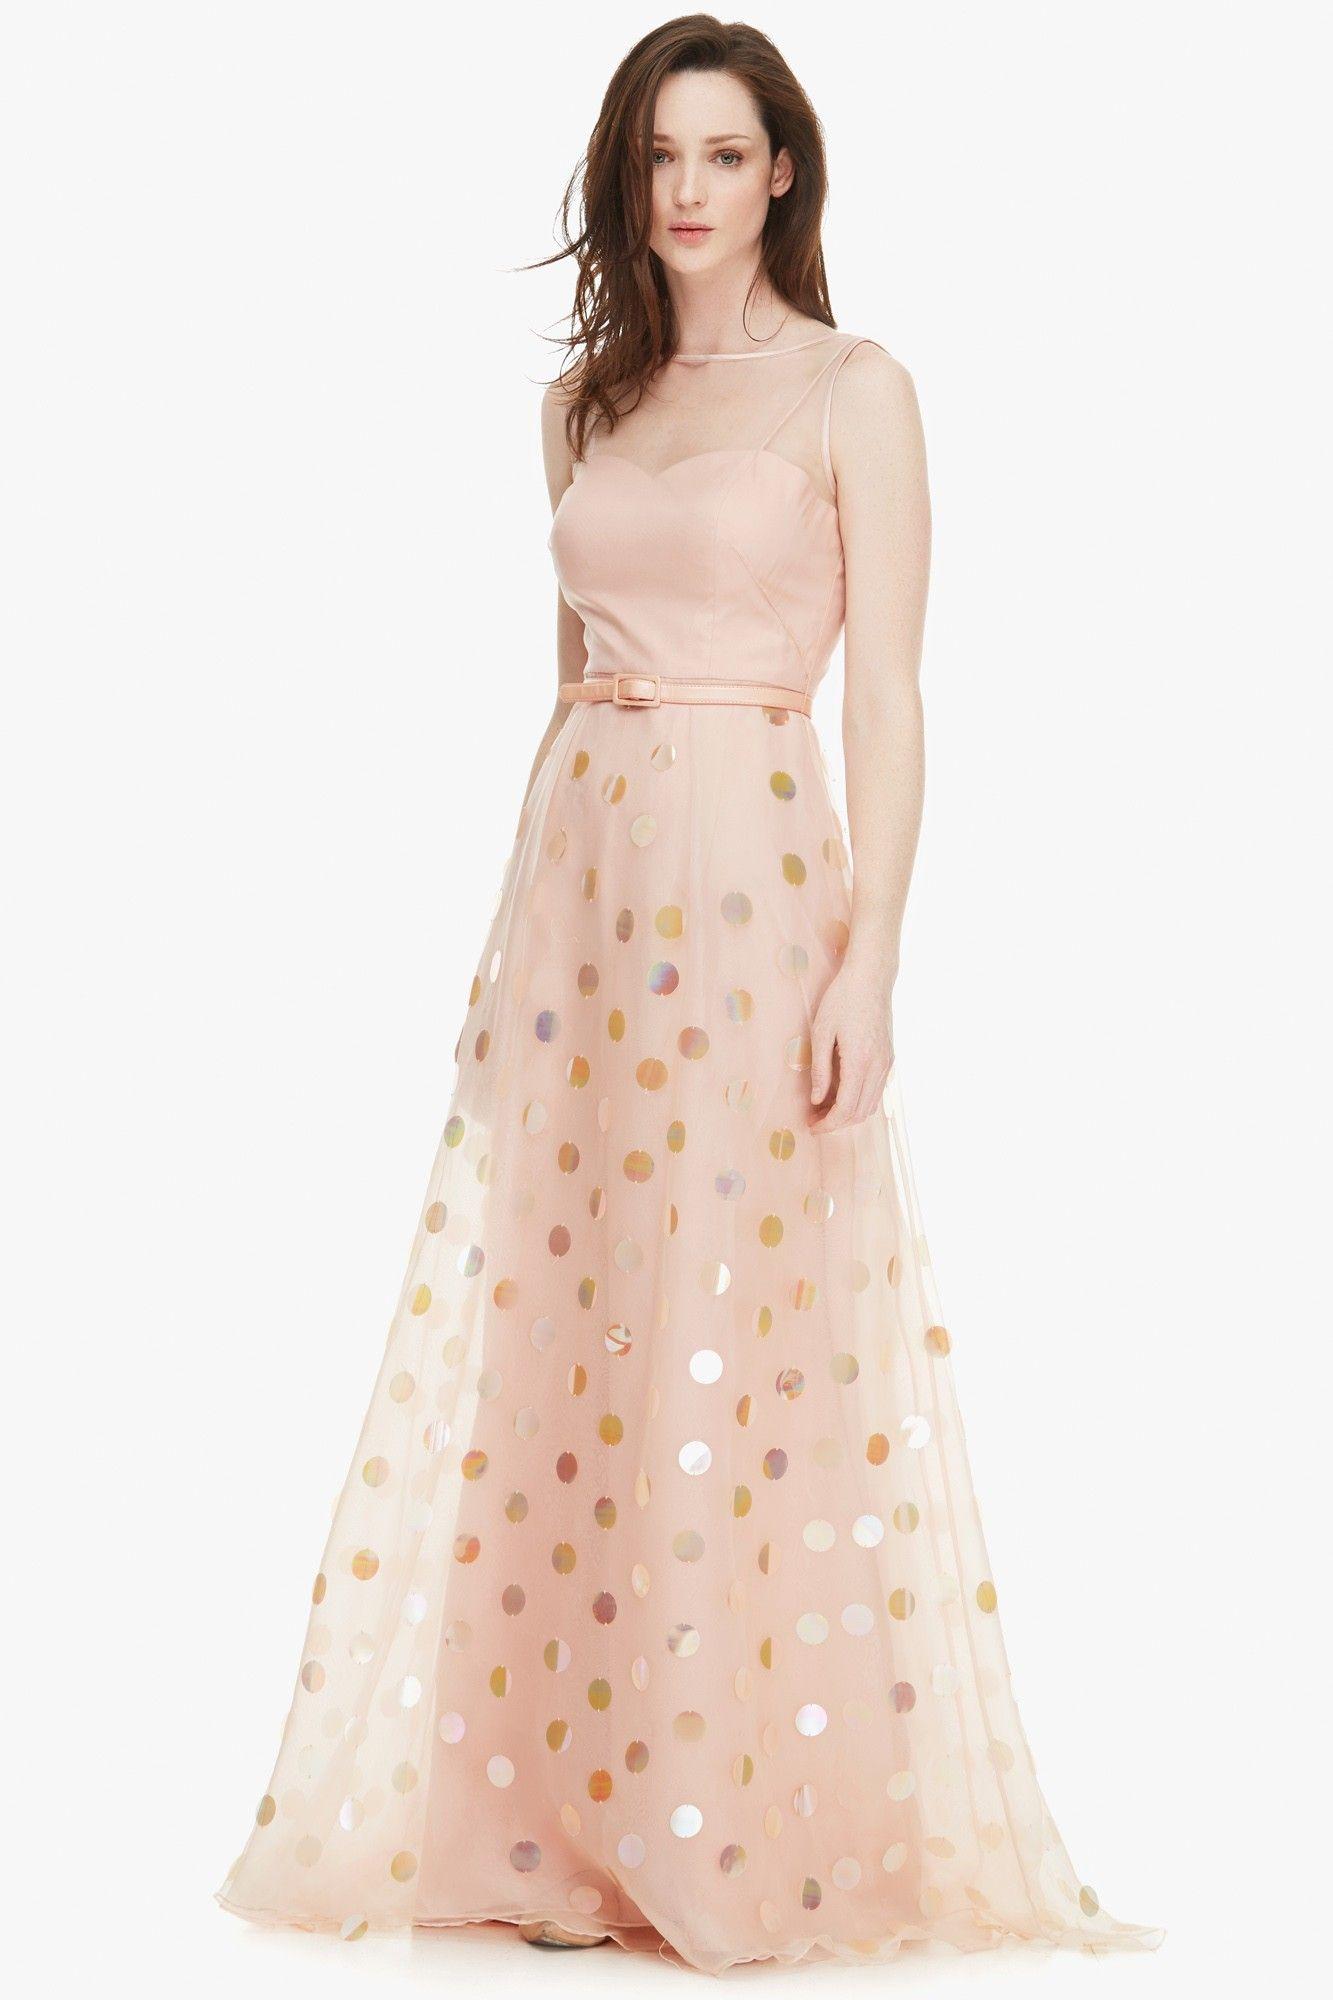 Organza lady gown adolfo dominguez adolfo dominguez for Vestidos largos adolfo dominguez outlet